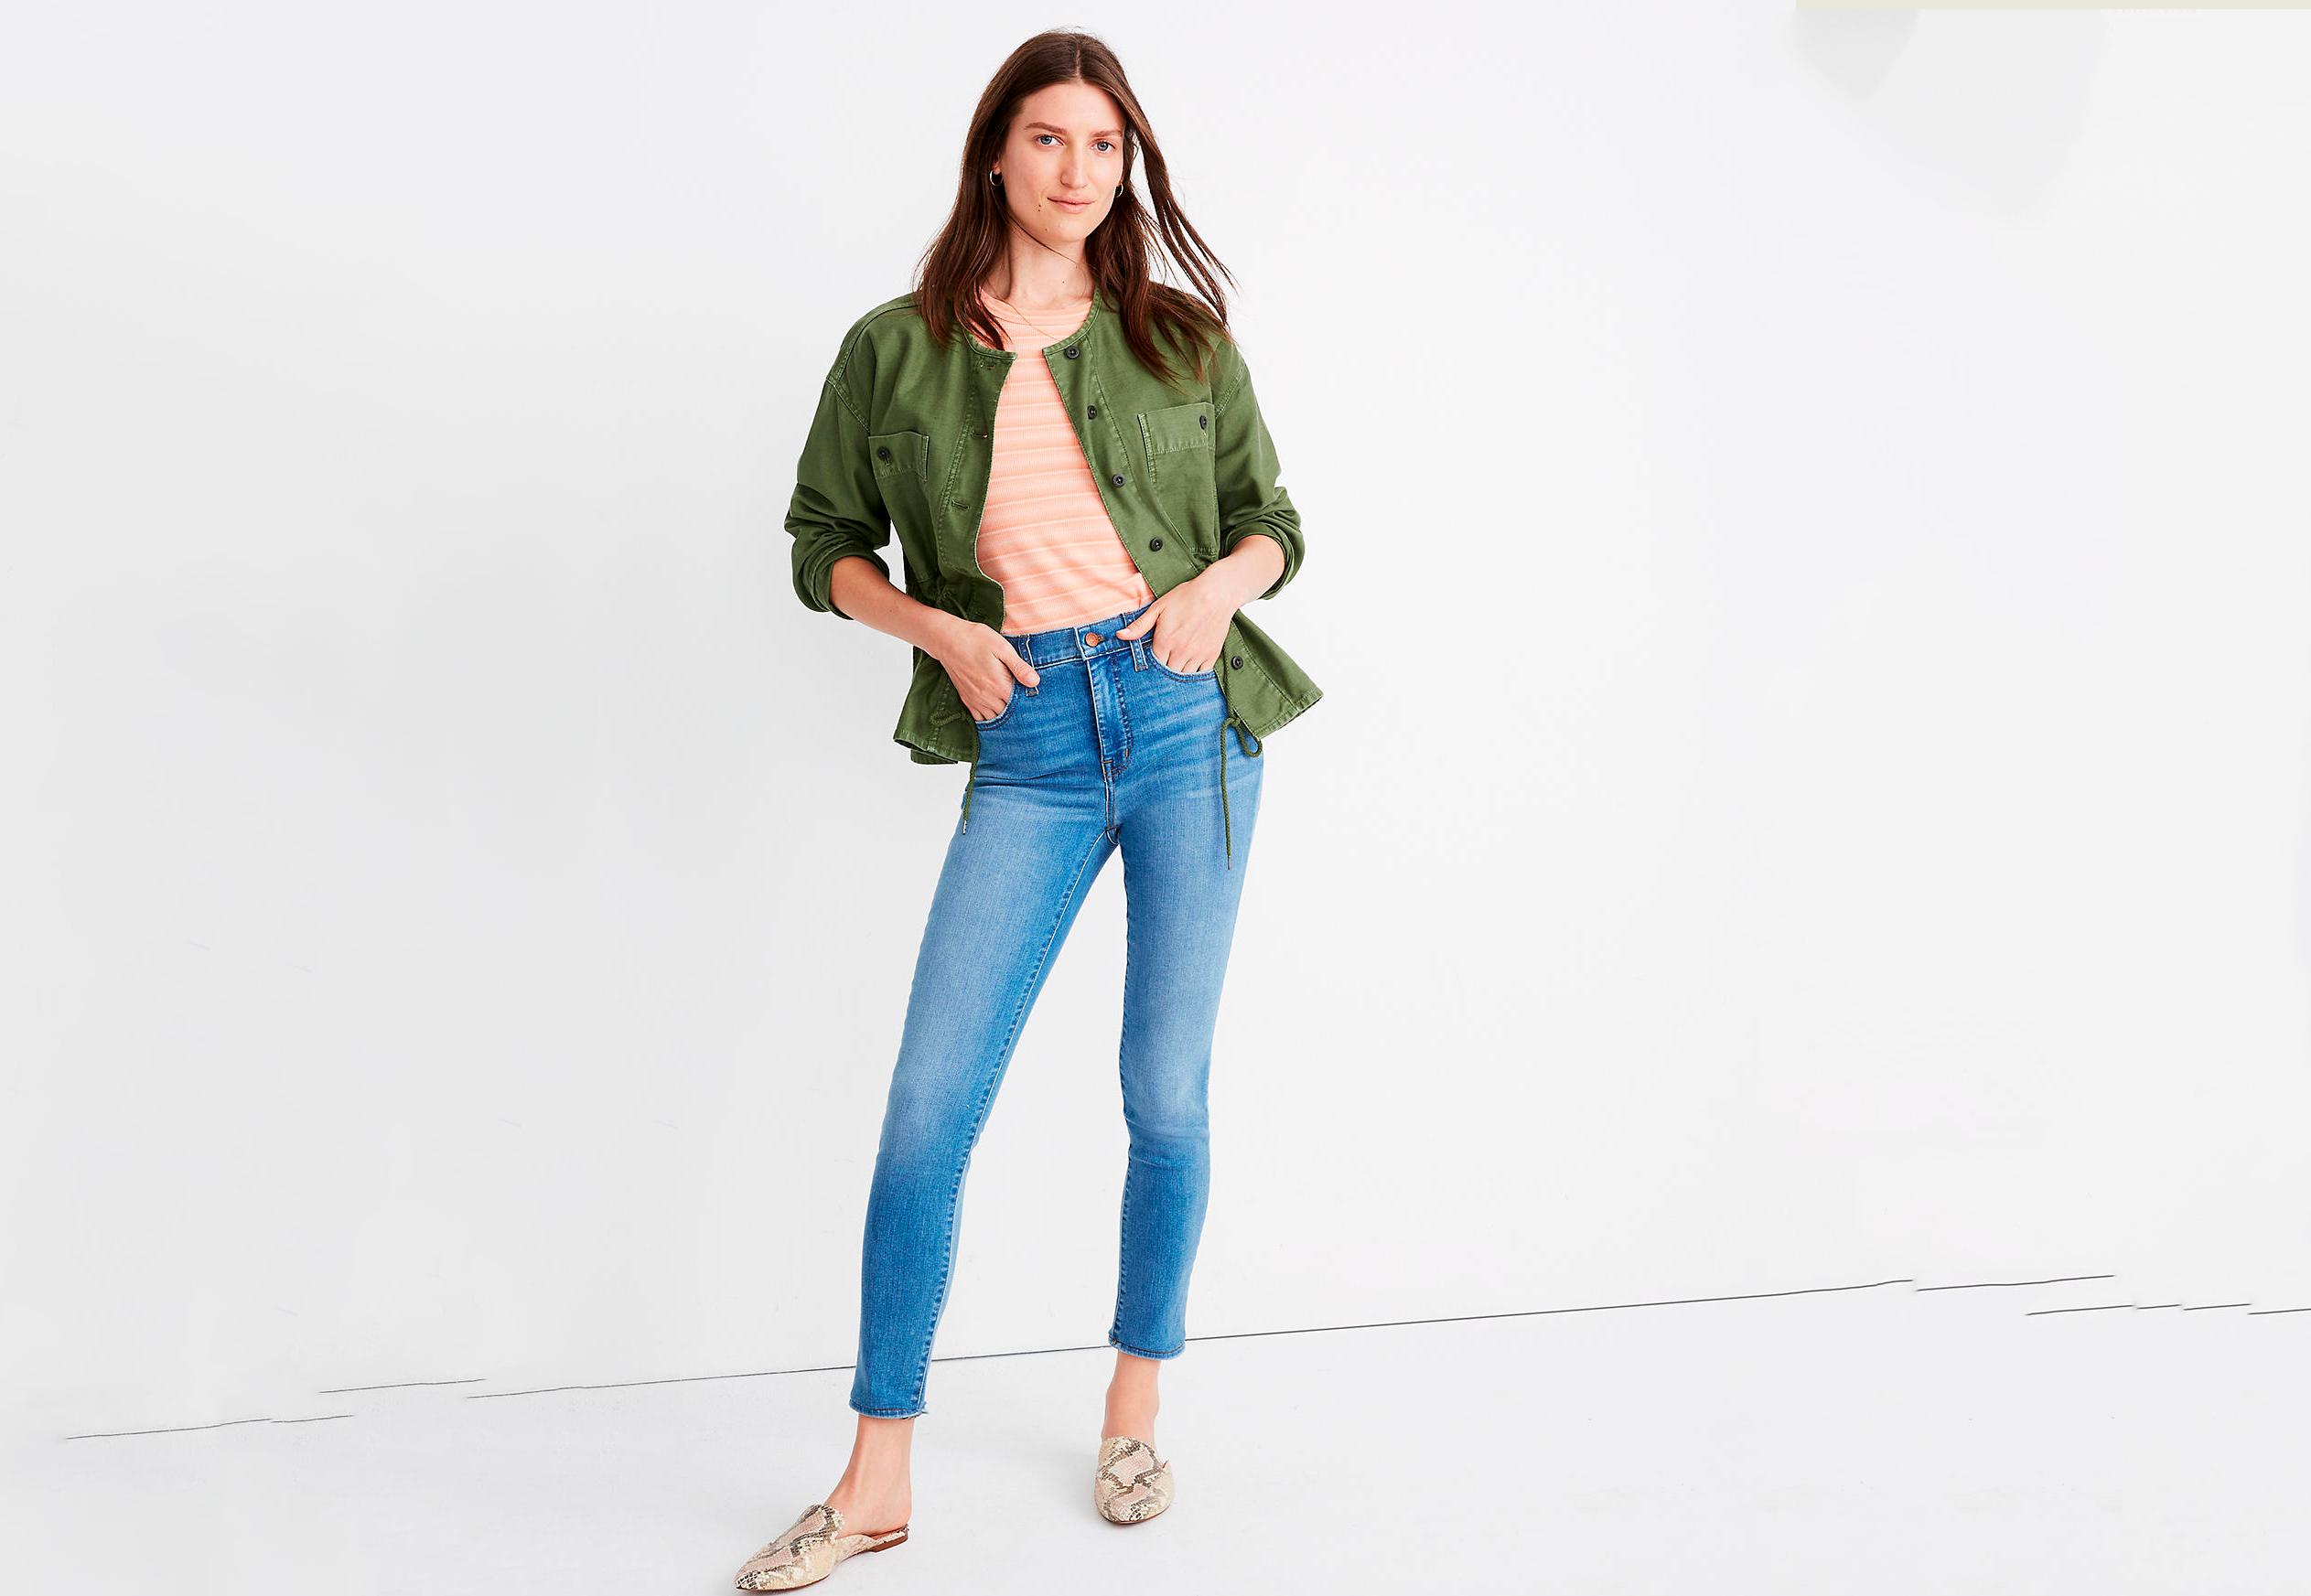 madewell petite high waisted jeans, best high-waisted jeans